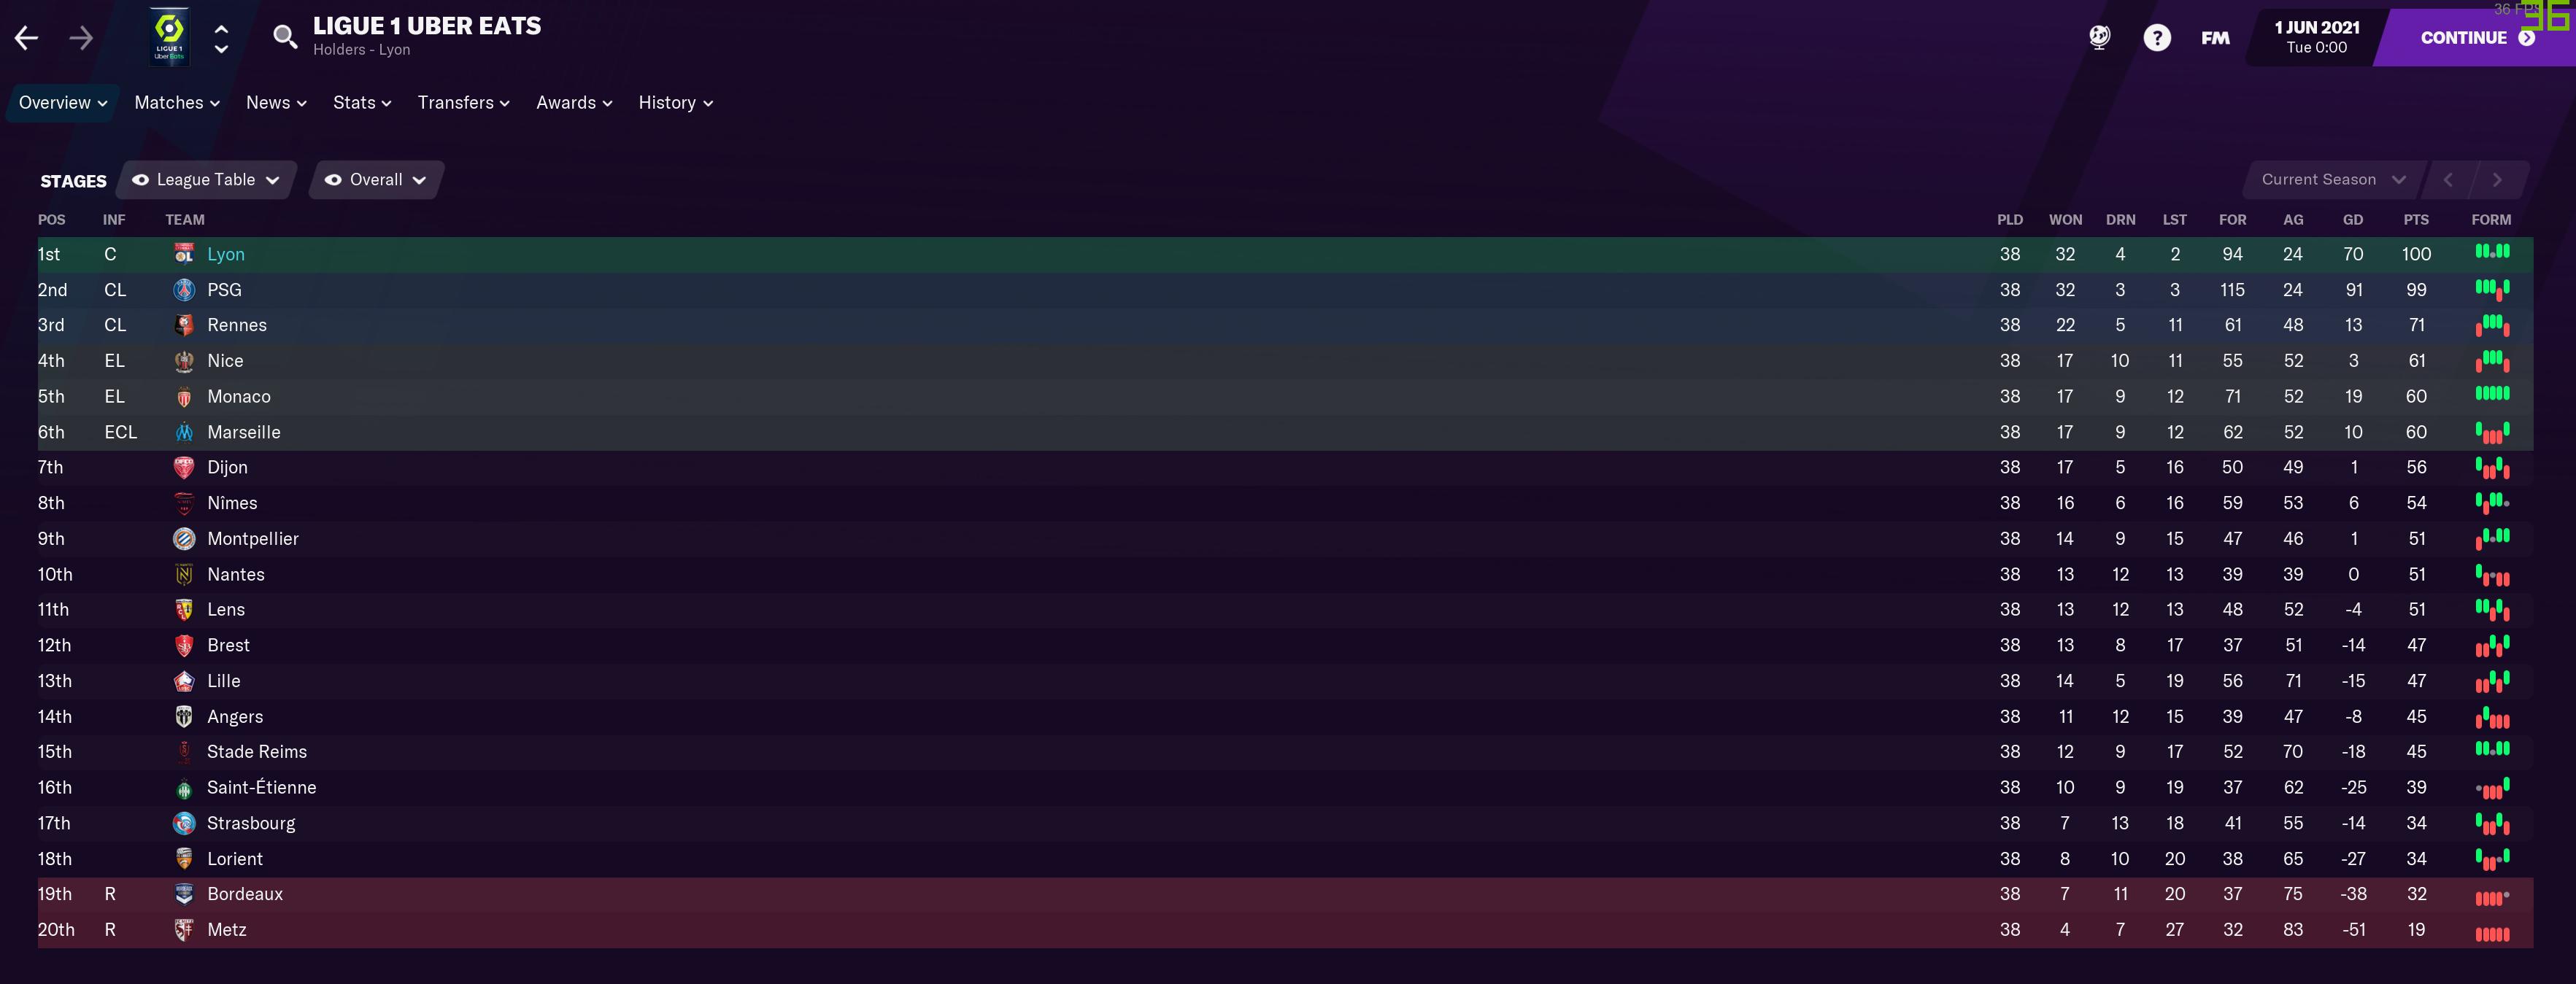 #15 Lyon Ligue 1 Champions.PNG